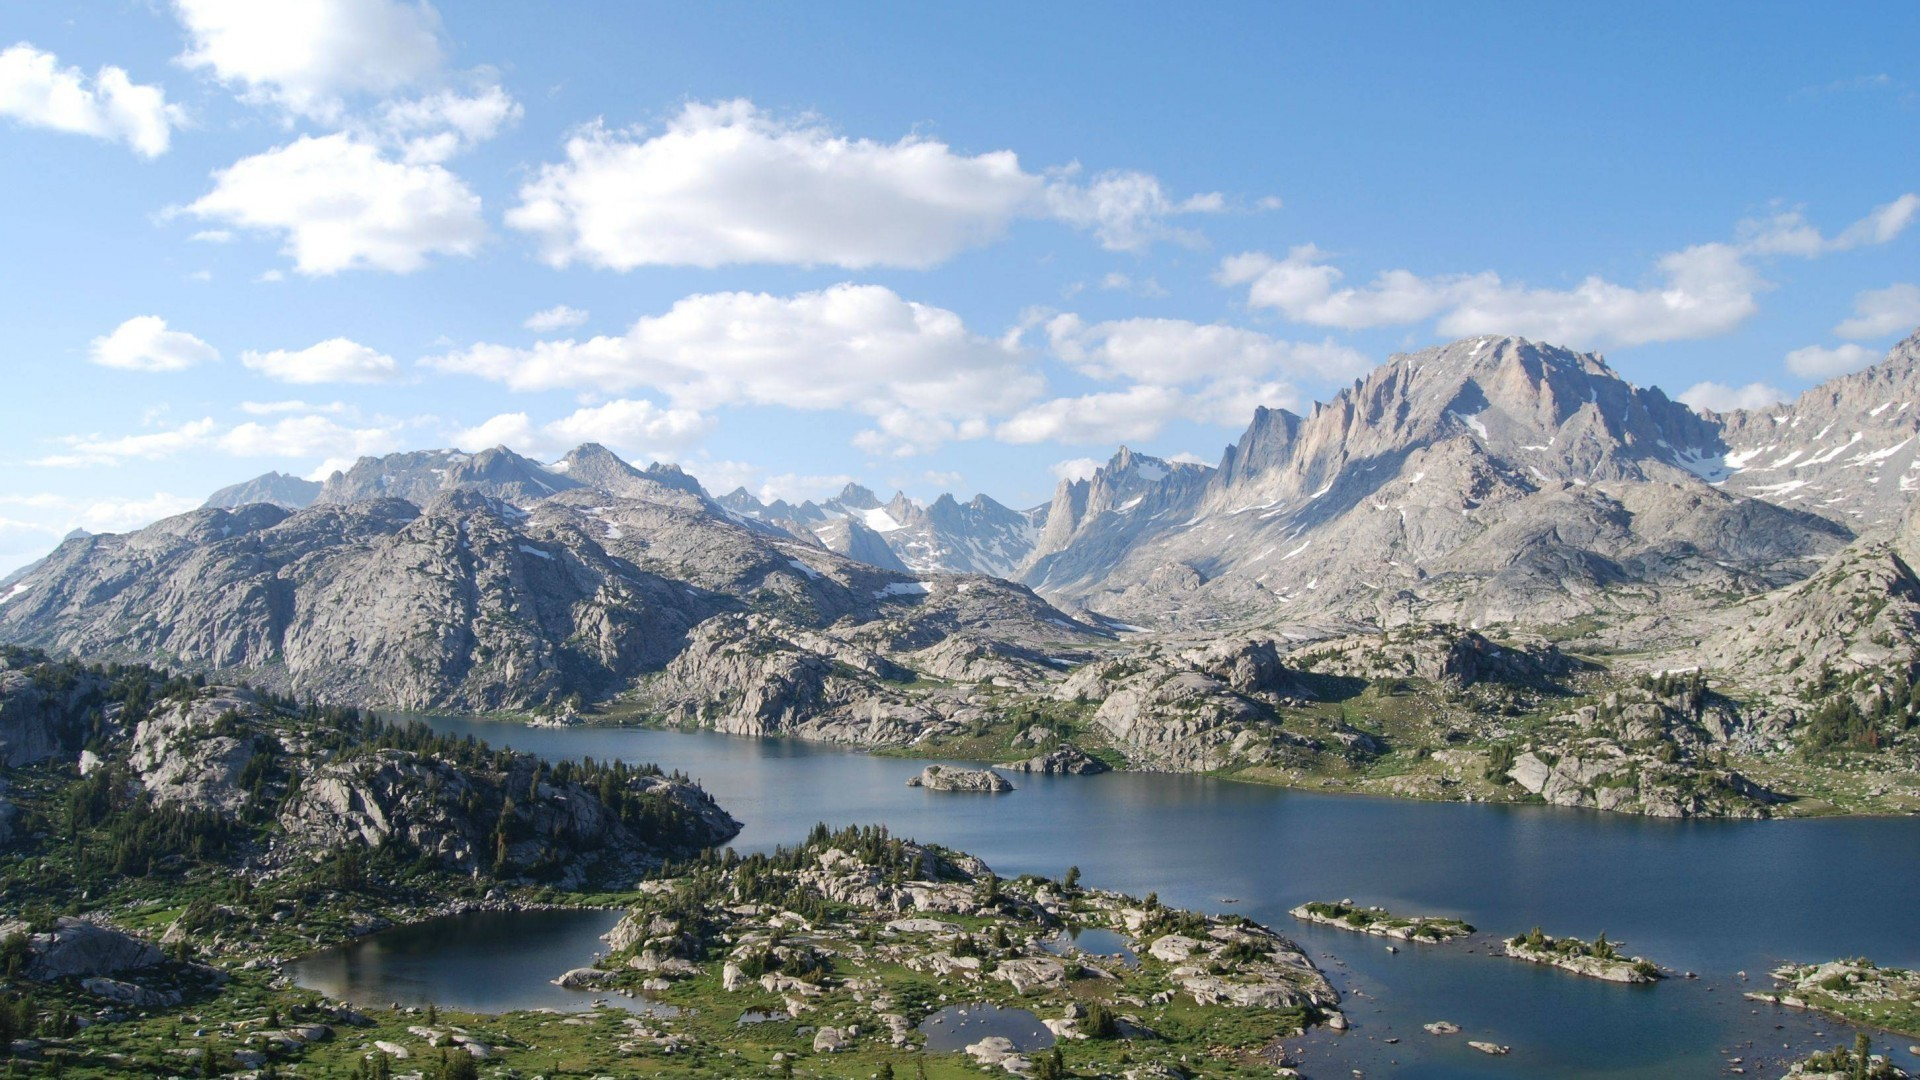 Mountains-landscapes-nature-lakes-the-elder-scrolls-v-skyrim-HD-Wallpapers .jpg